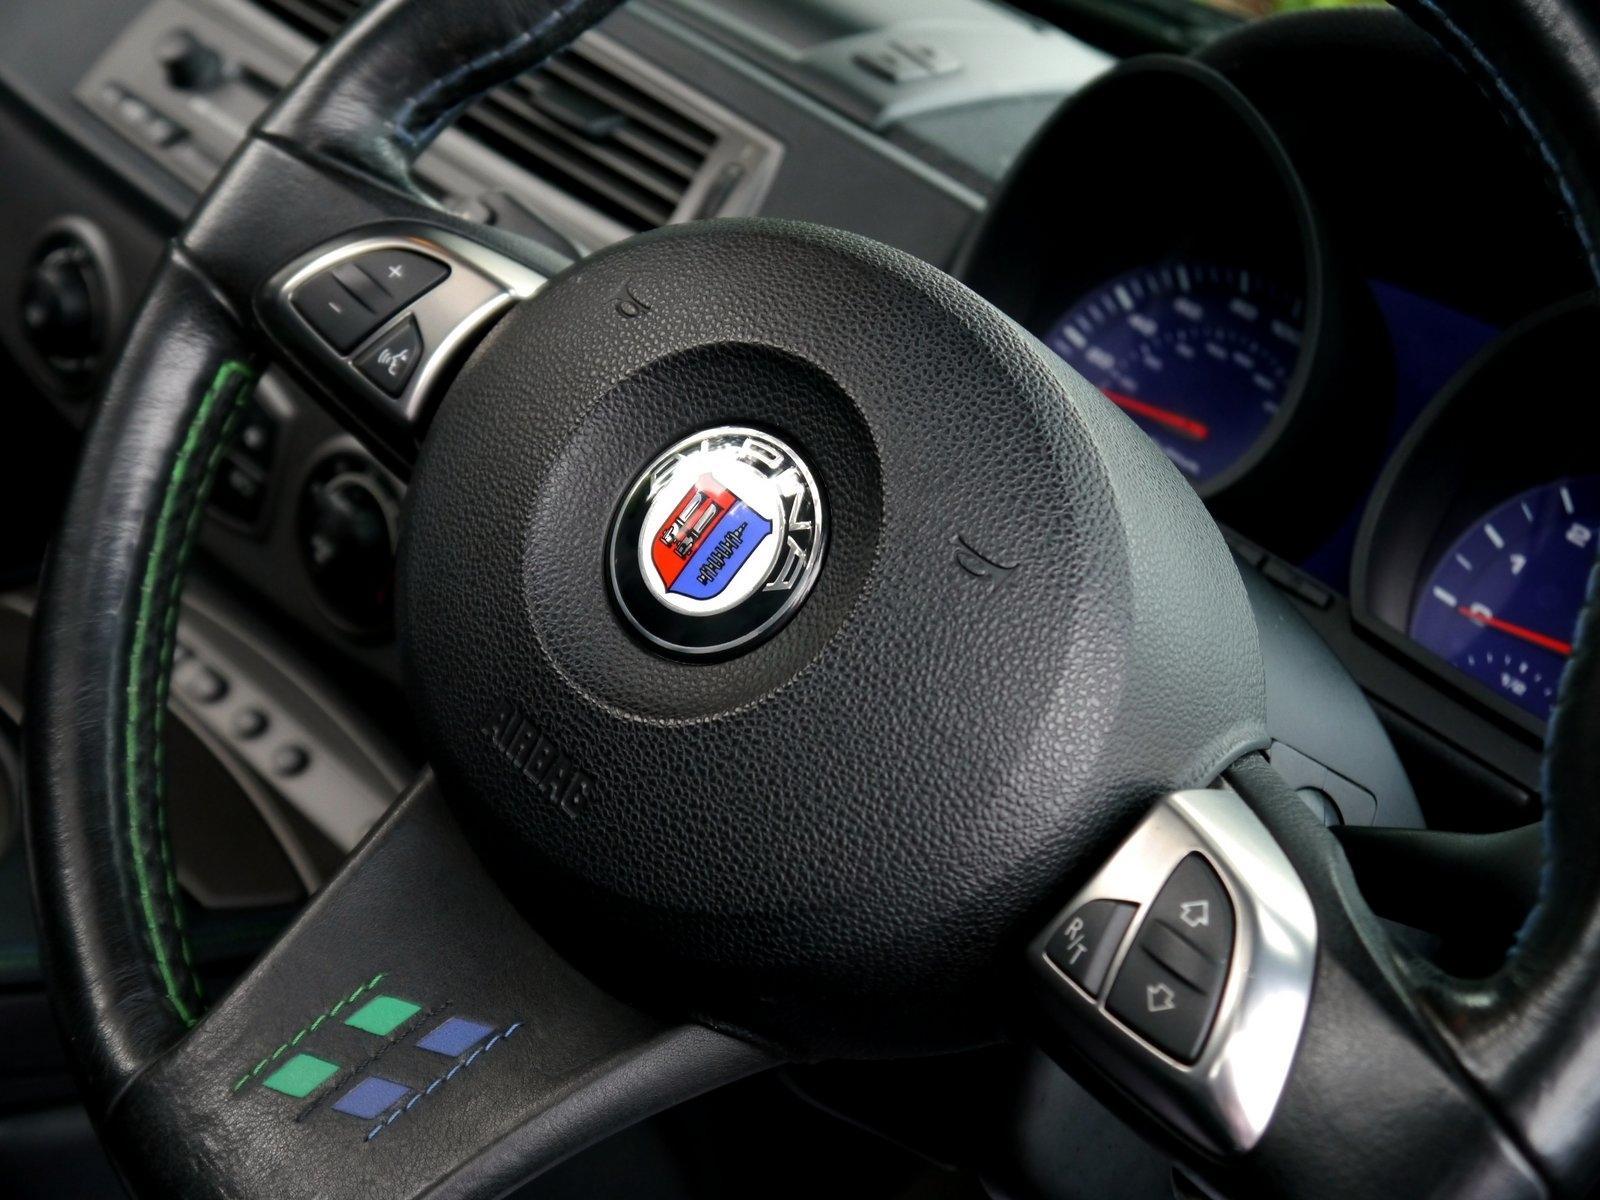 BMWALPINA ROADSTER 3.4 S LUX - RARE VEHICLE - BMW FSH #12